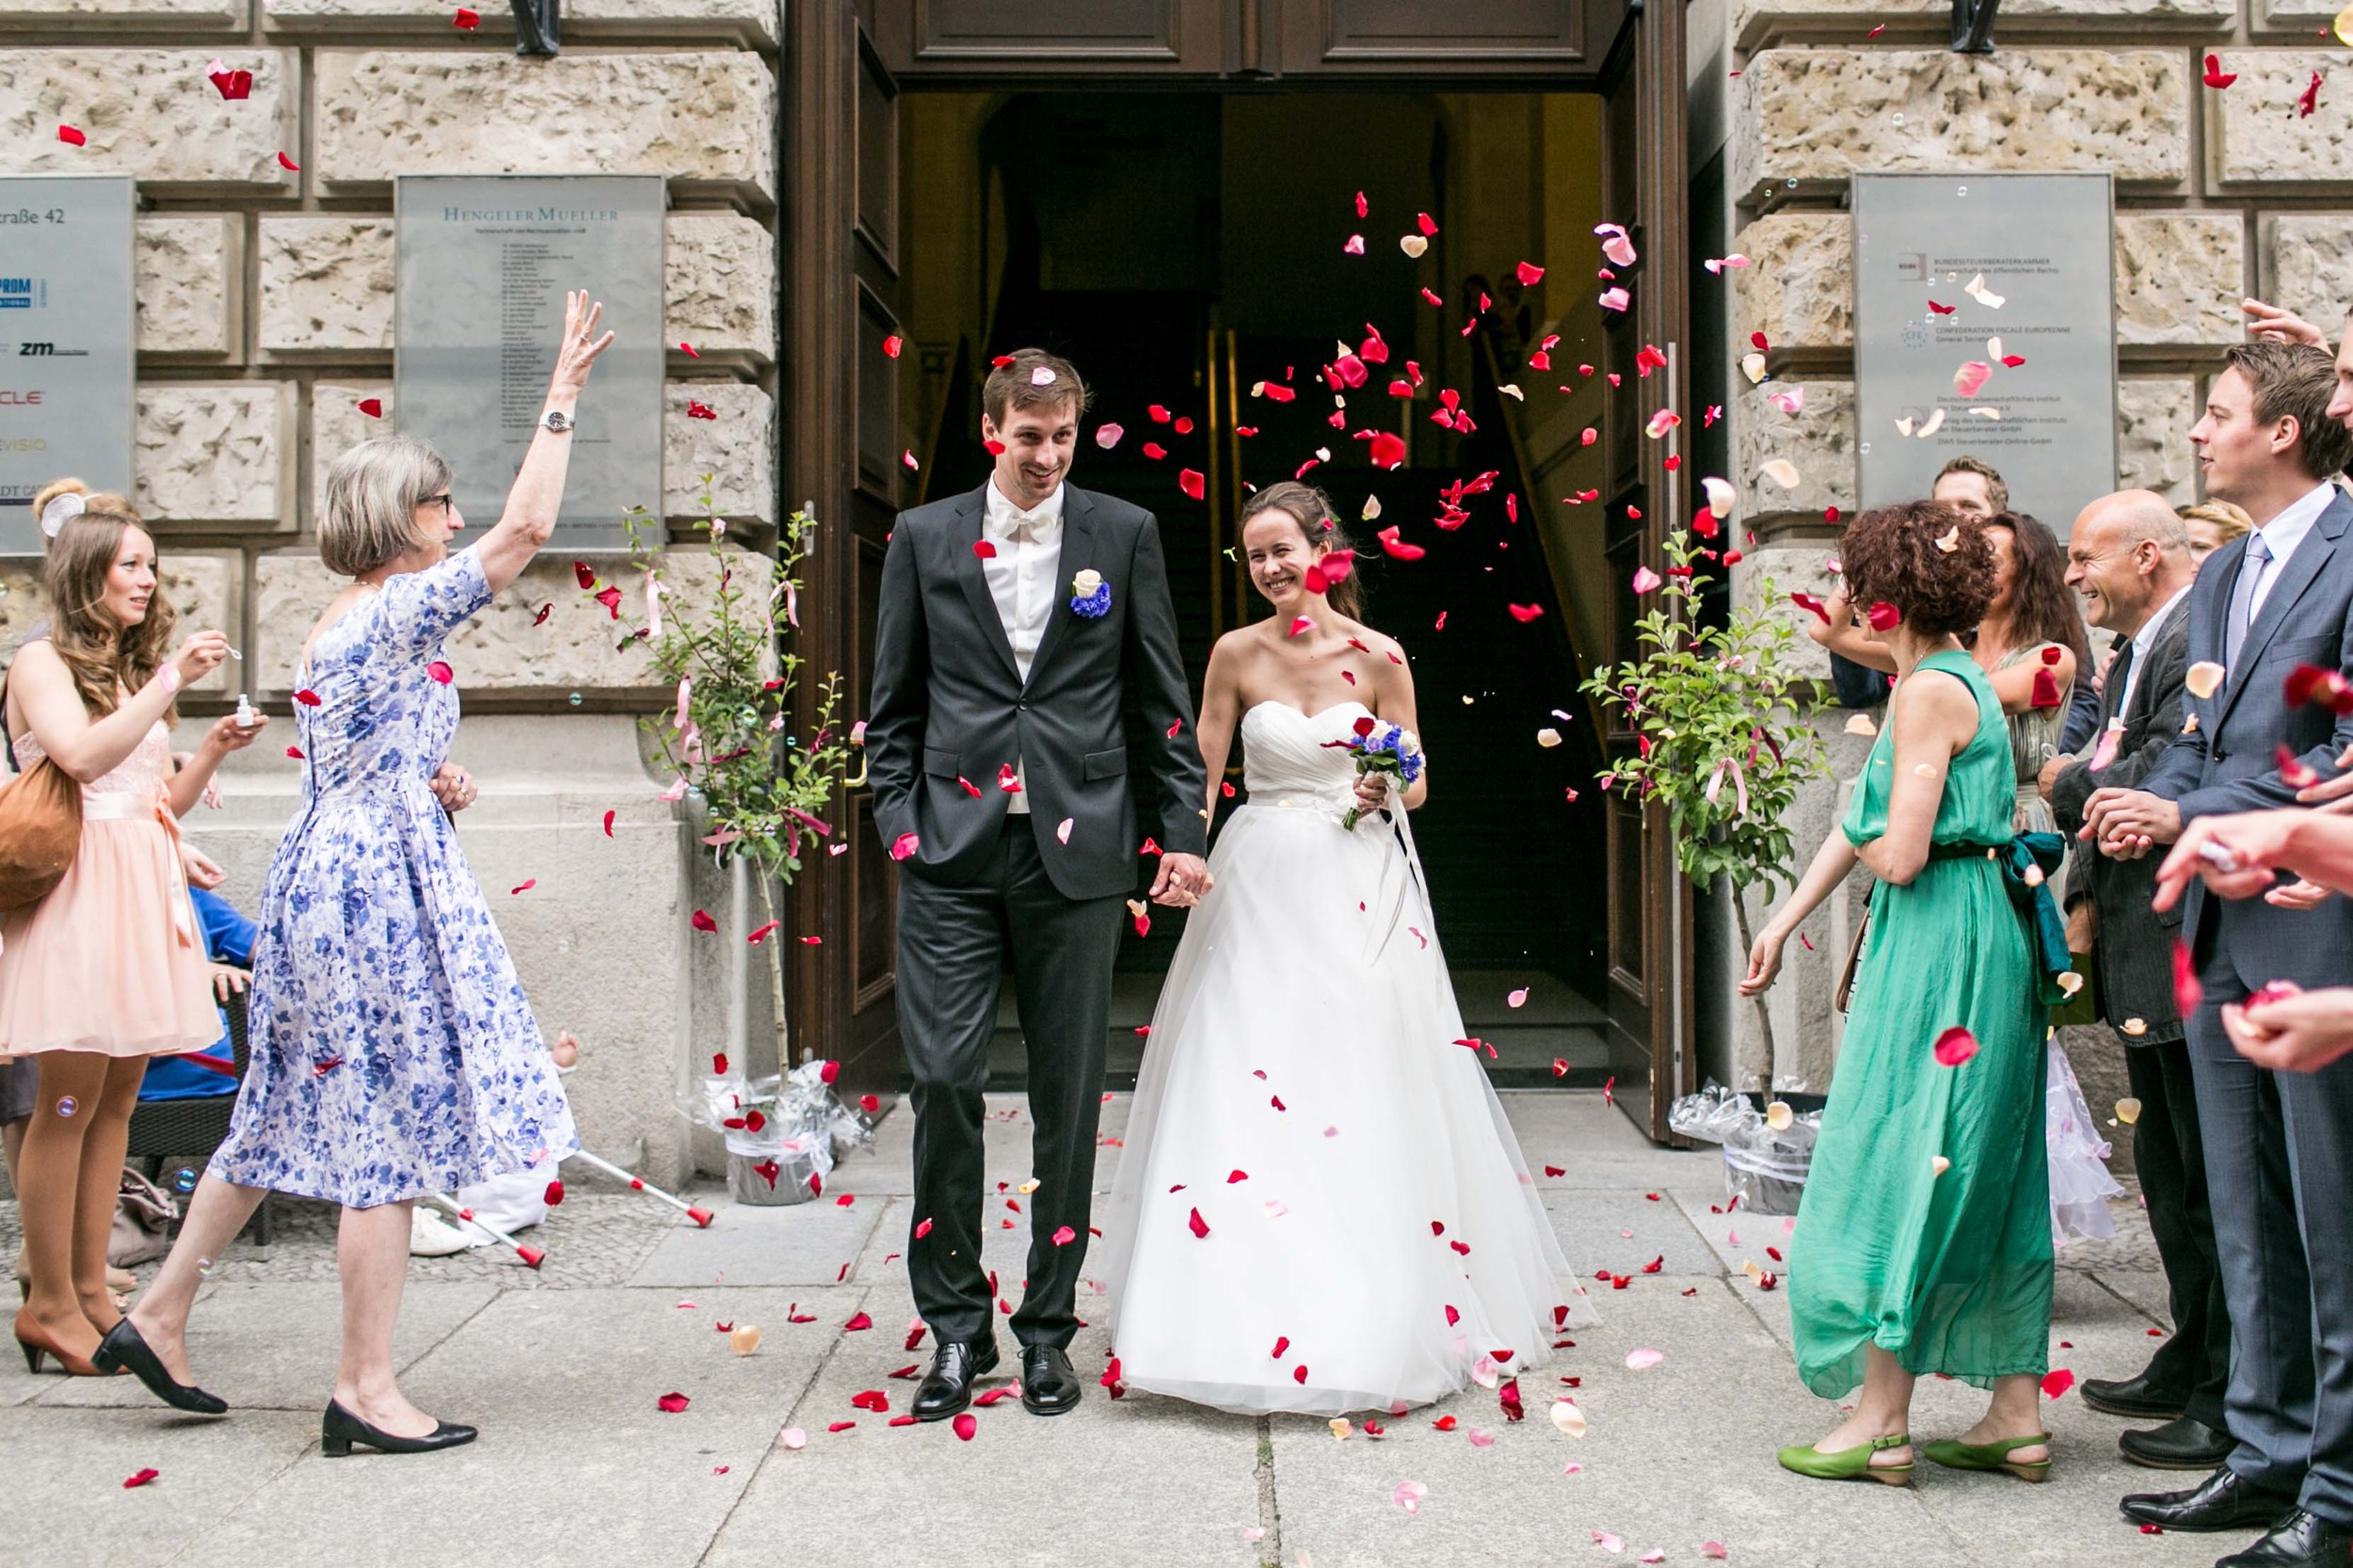 Berlin Hochzeitsfotografie_Fran Burrows Fotografie-14.jpg